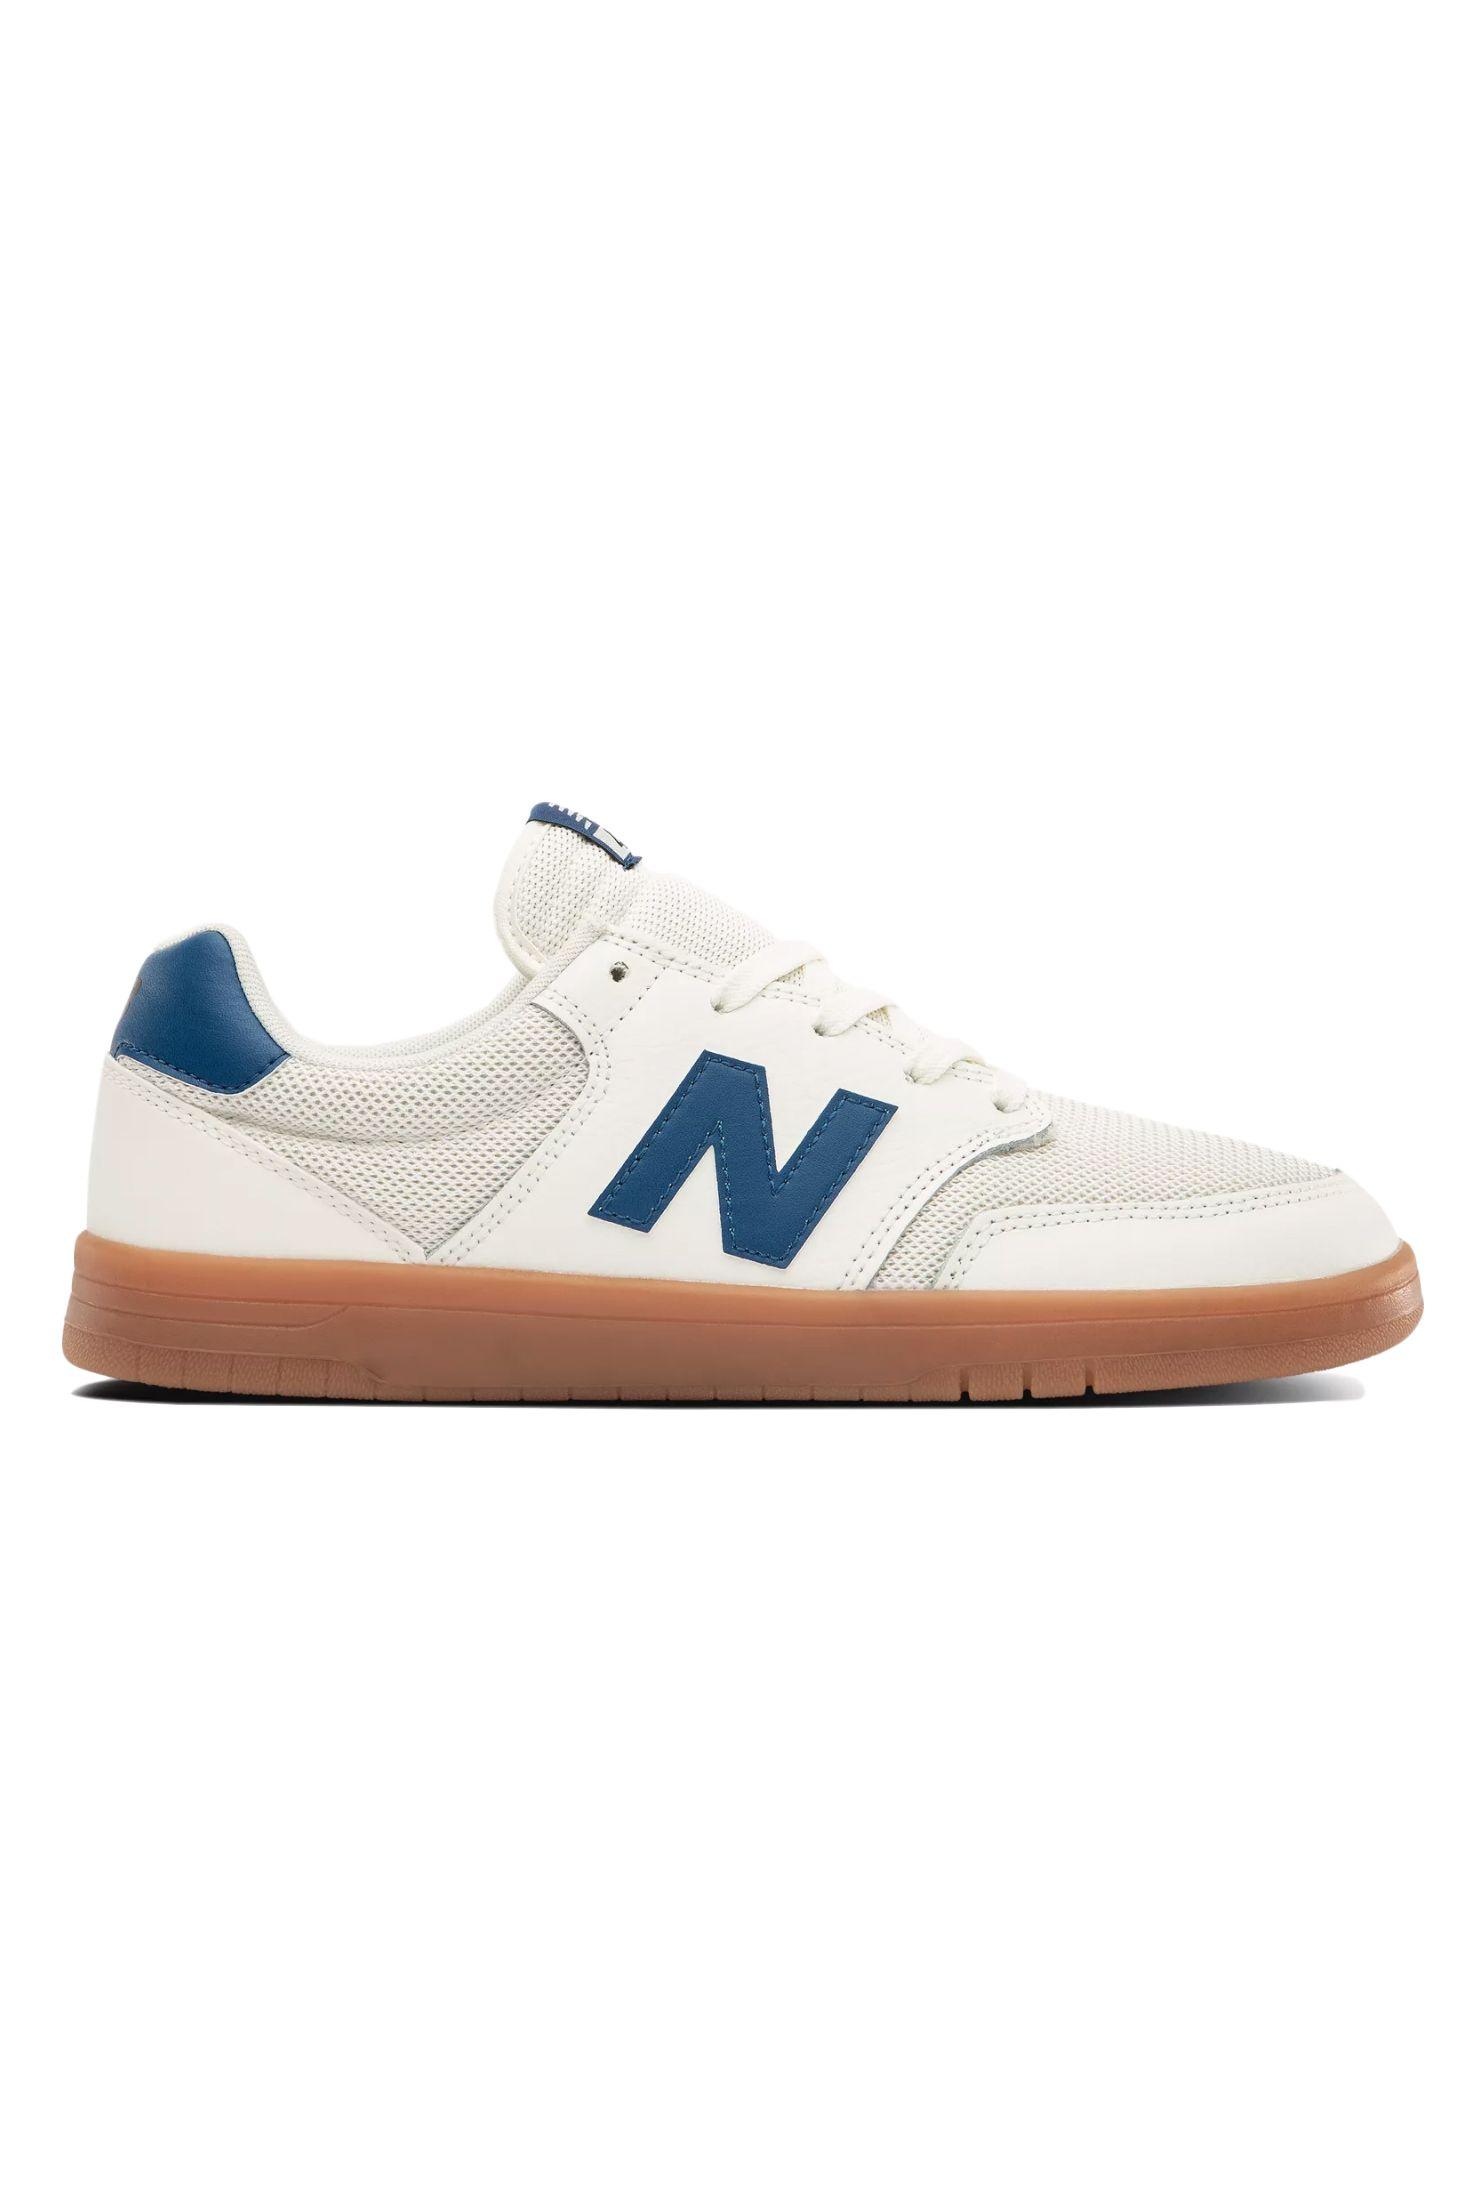 Tenis New Balance AM425 White/Blue